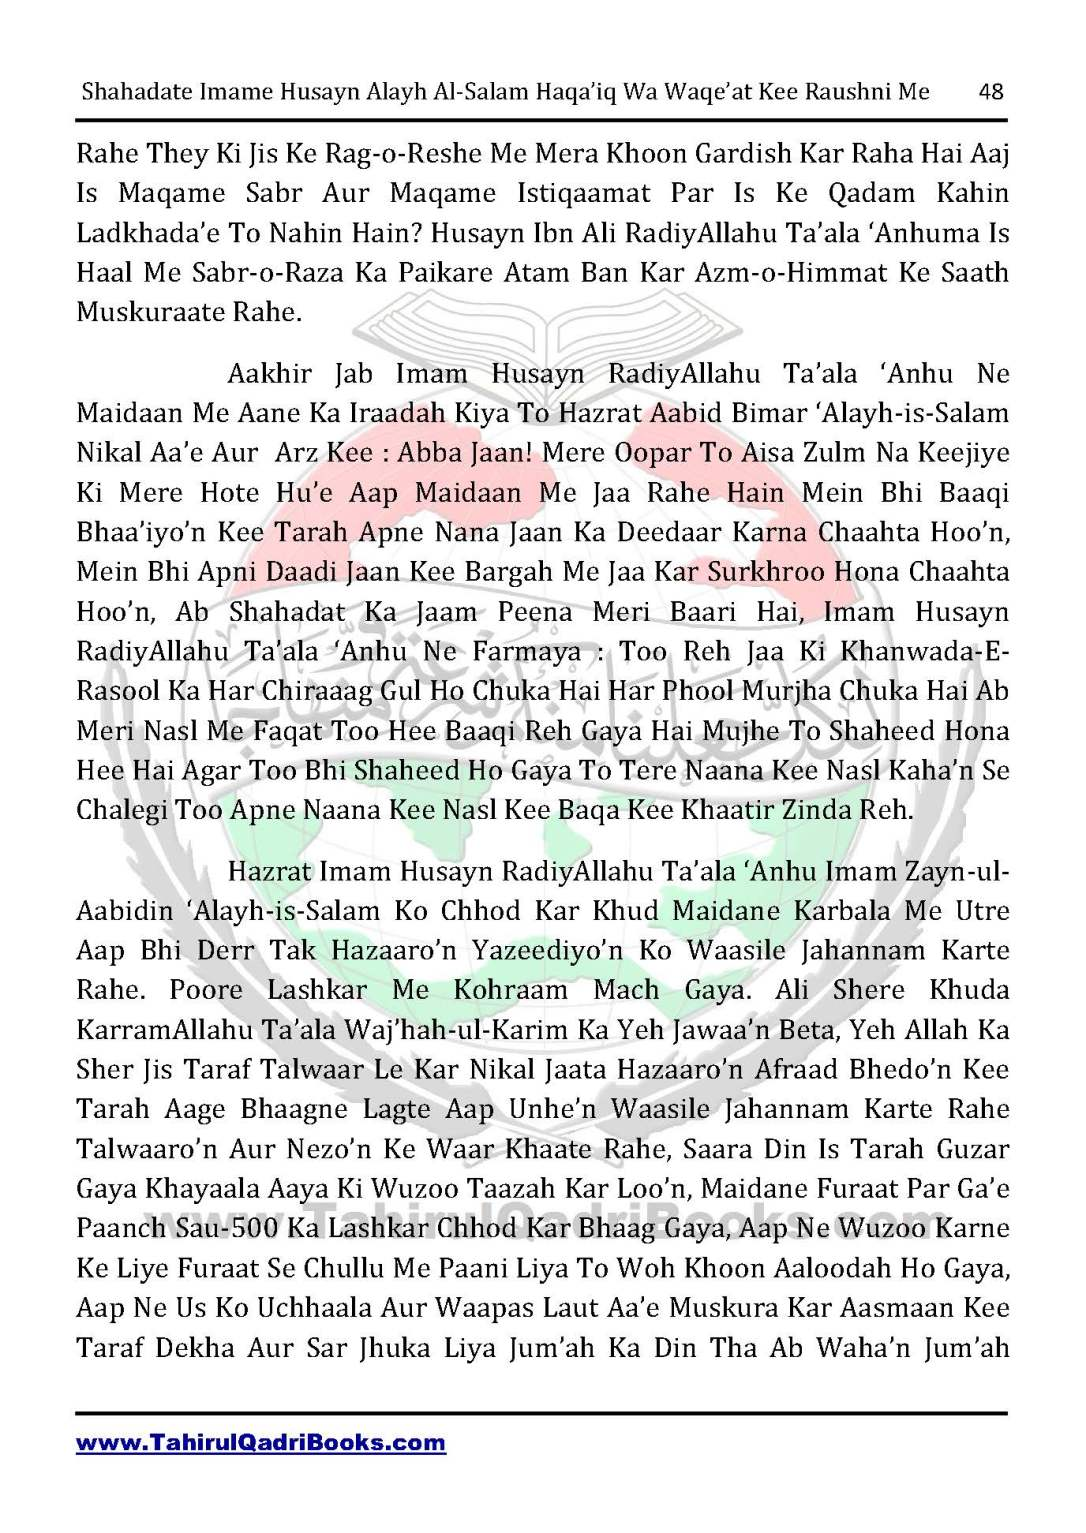 shahadate-imame-husayn-alayh-is-salam-haqaiq-wa-waqe_at-kee-raushni-me-in-roman-urdu-unlocked_Page_48